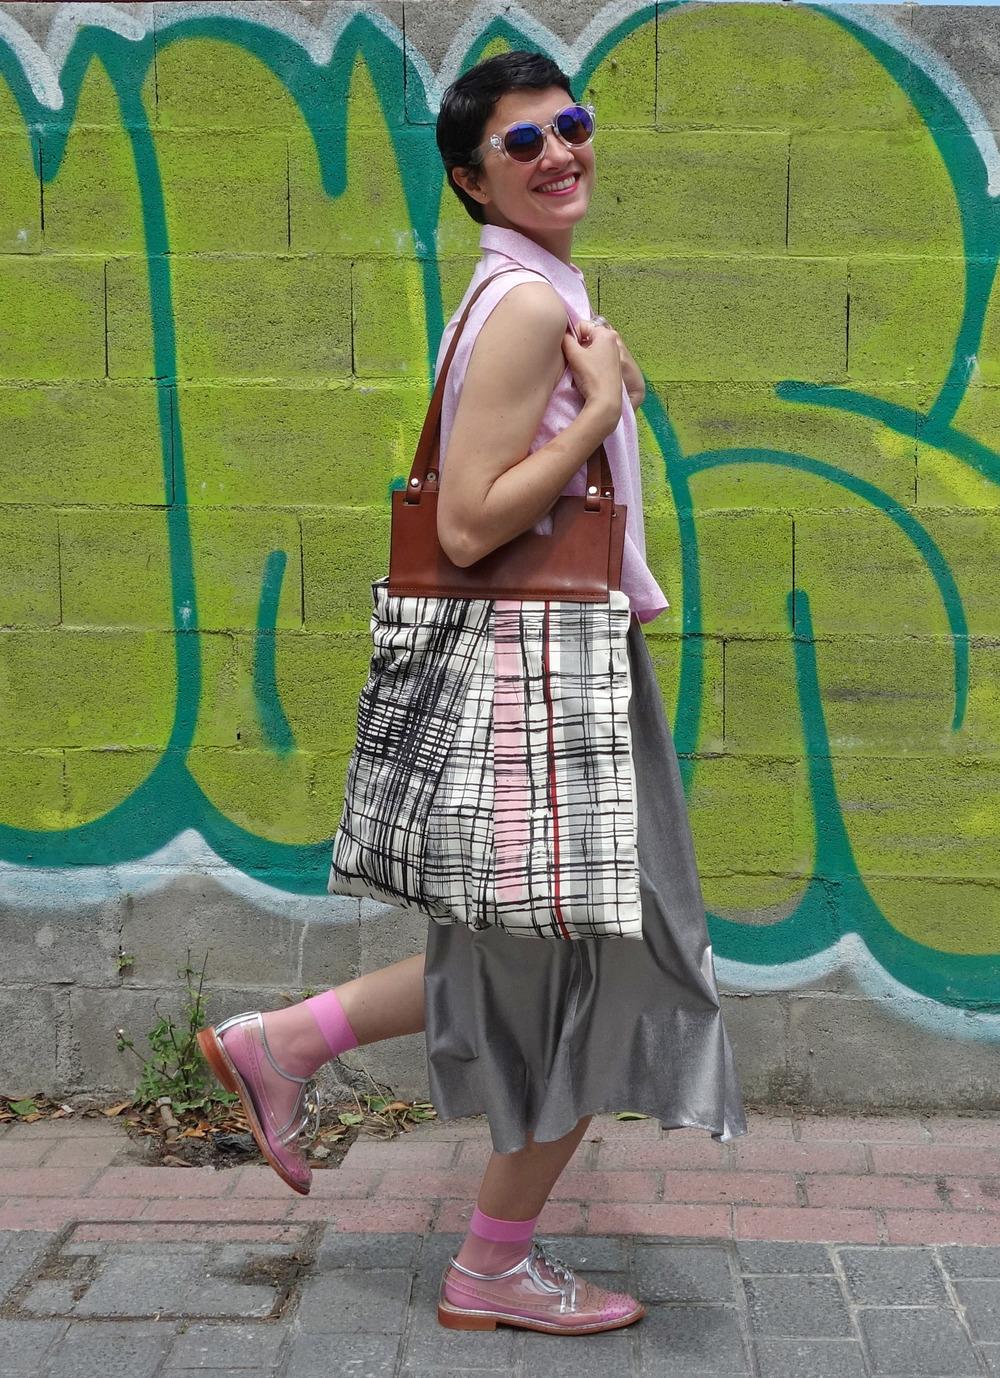 Back_To_Trendy_Airova_Shirt_Silver_Skirt_Transparent_Shoes_6.JPG